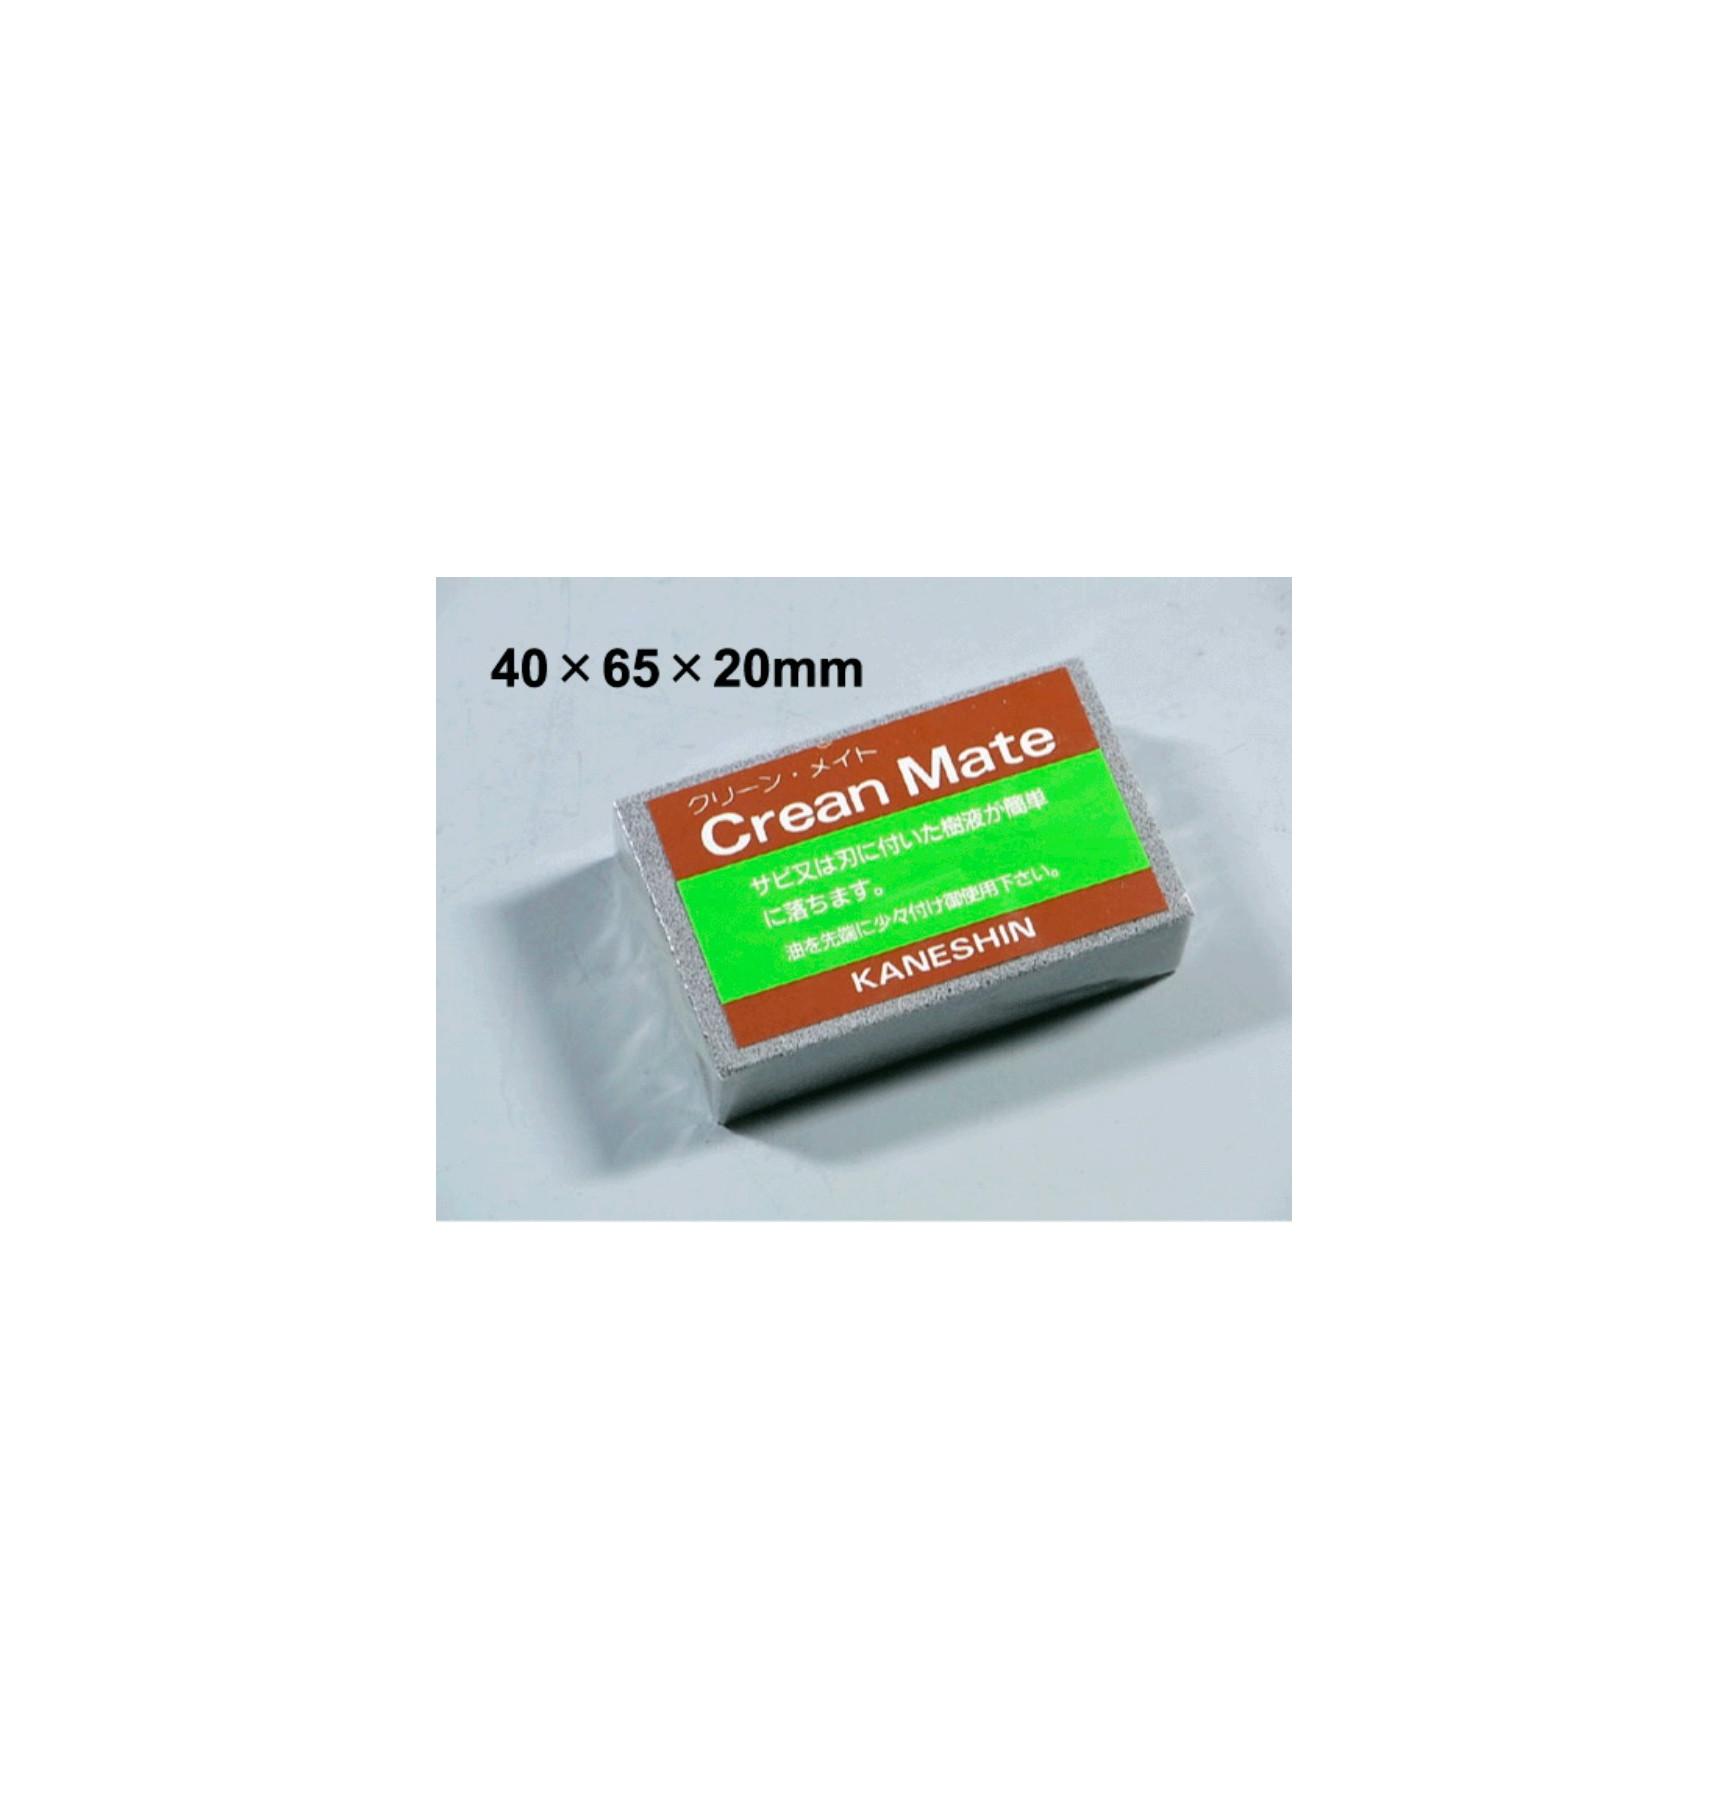 CREAN MATE180g (No.701)